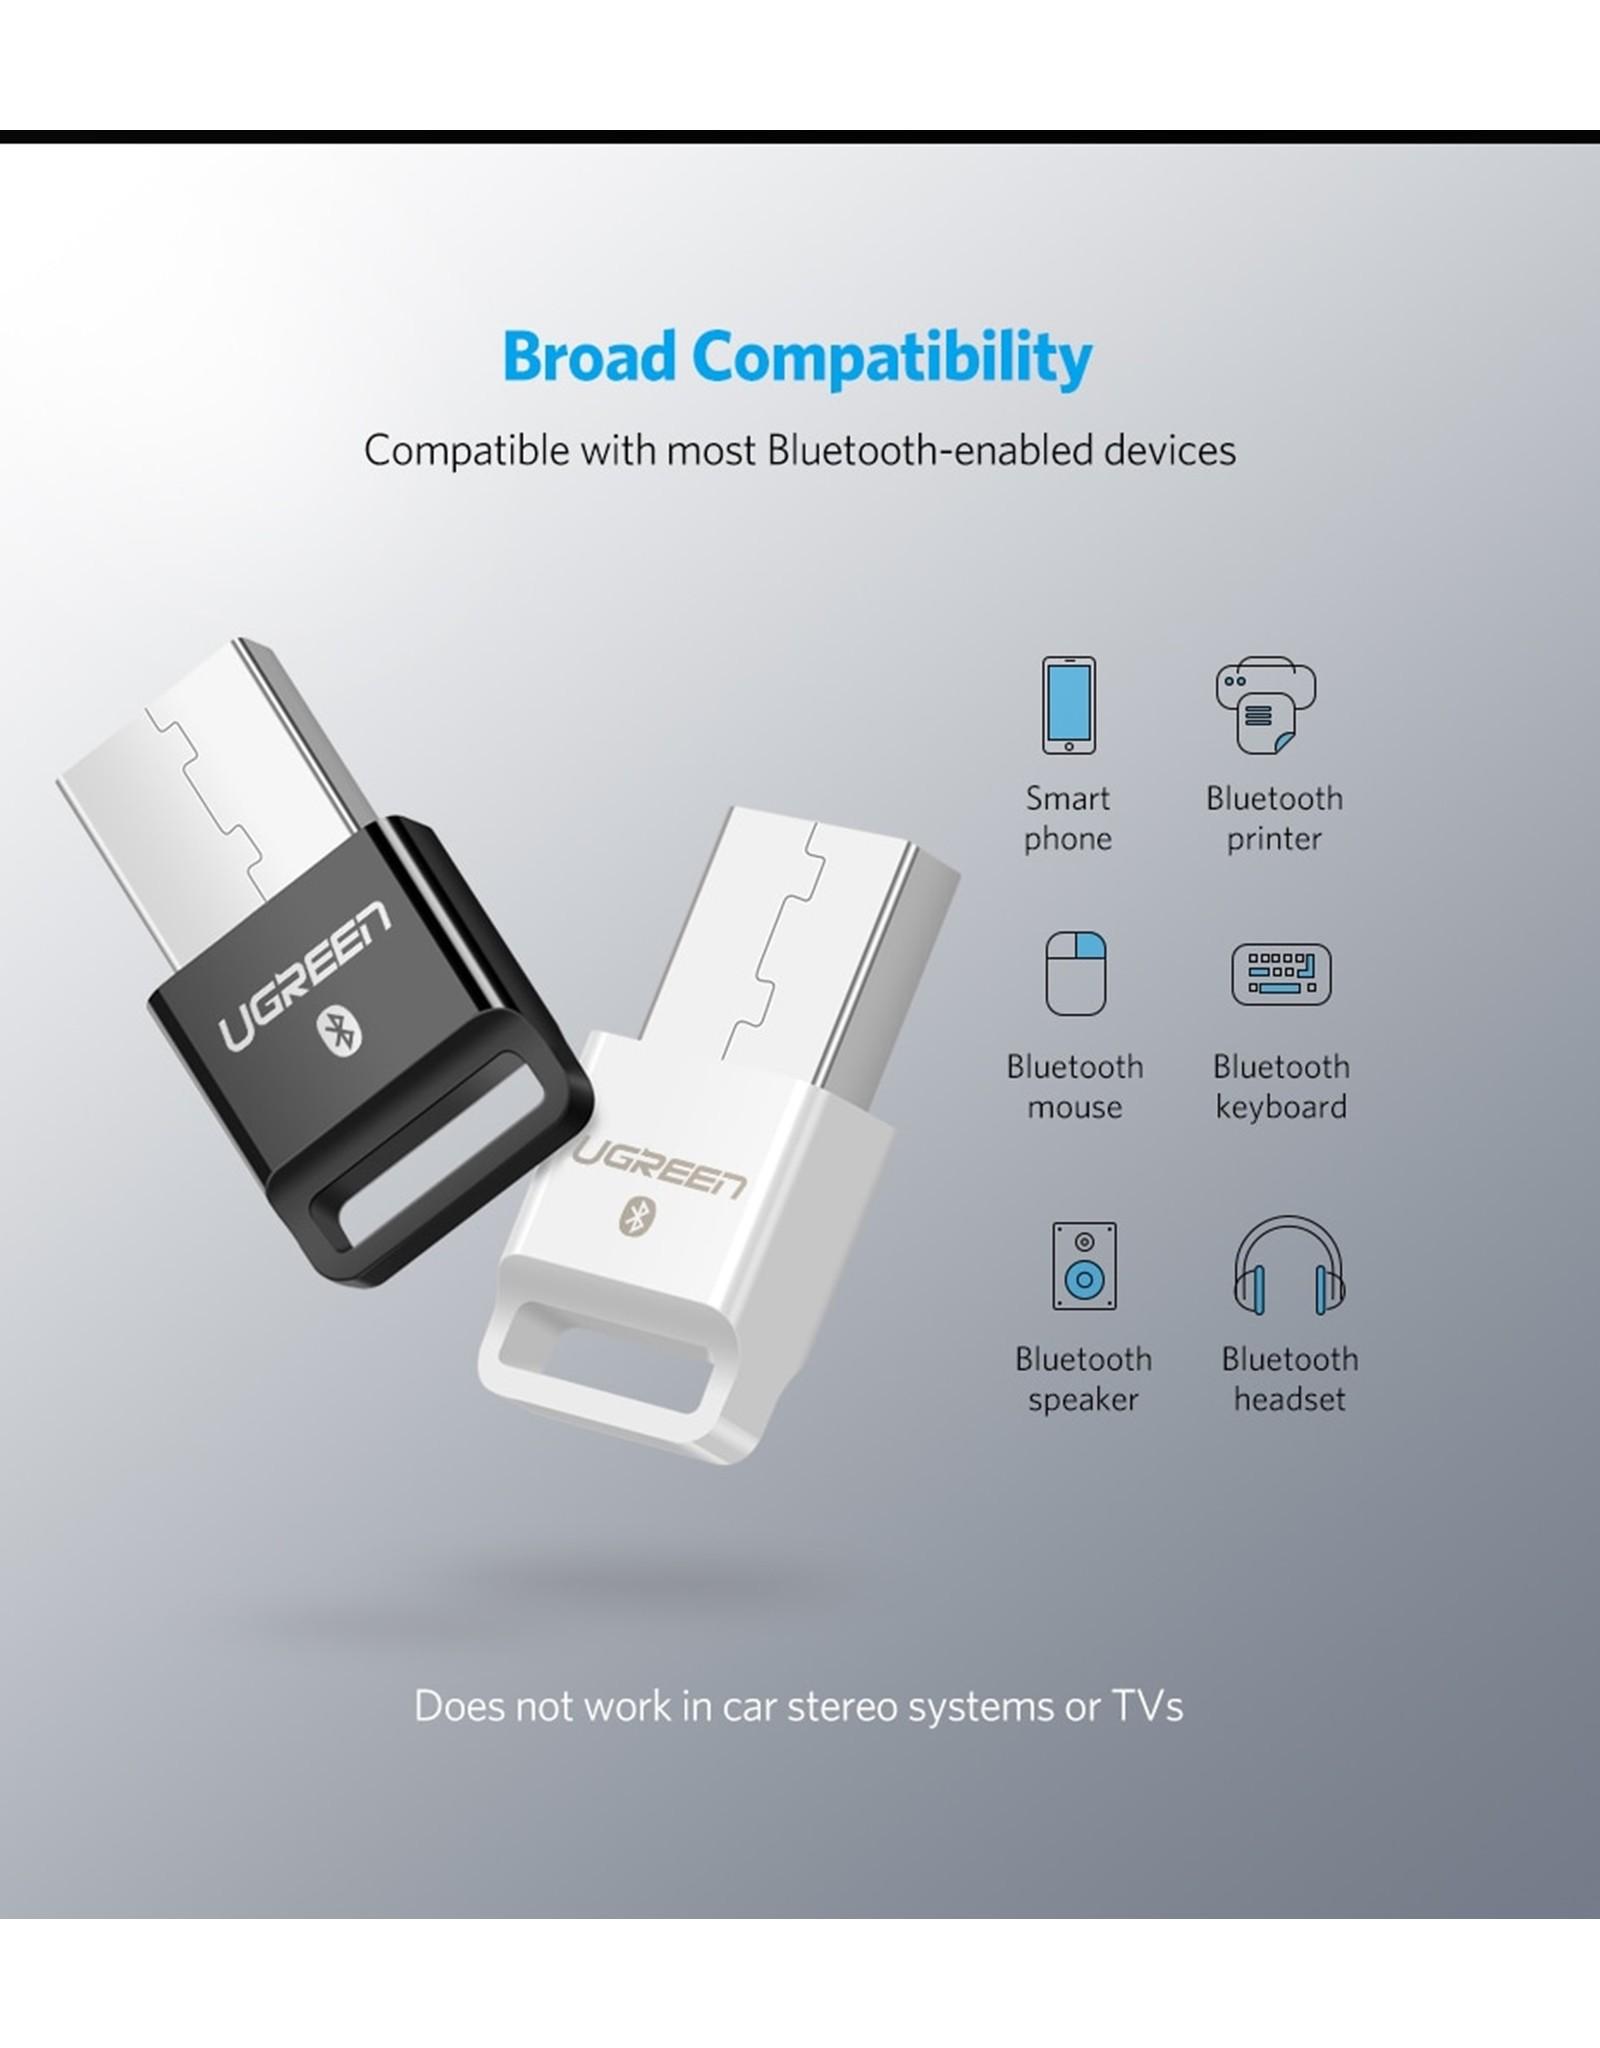 UGREEN USB 2.0 Bluetooth-adapter APTX Bluetooth V4.0 dongle audio-ontvanger Bluetooth-zend- Wit